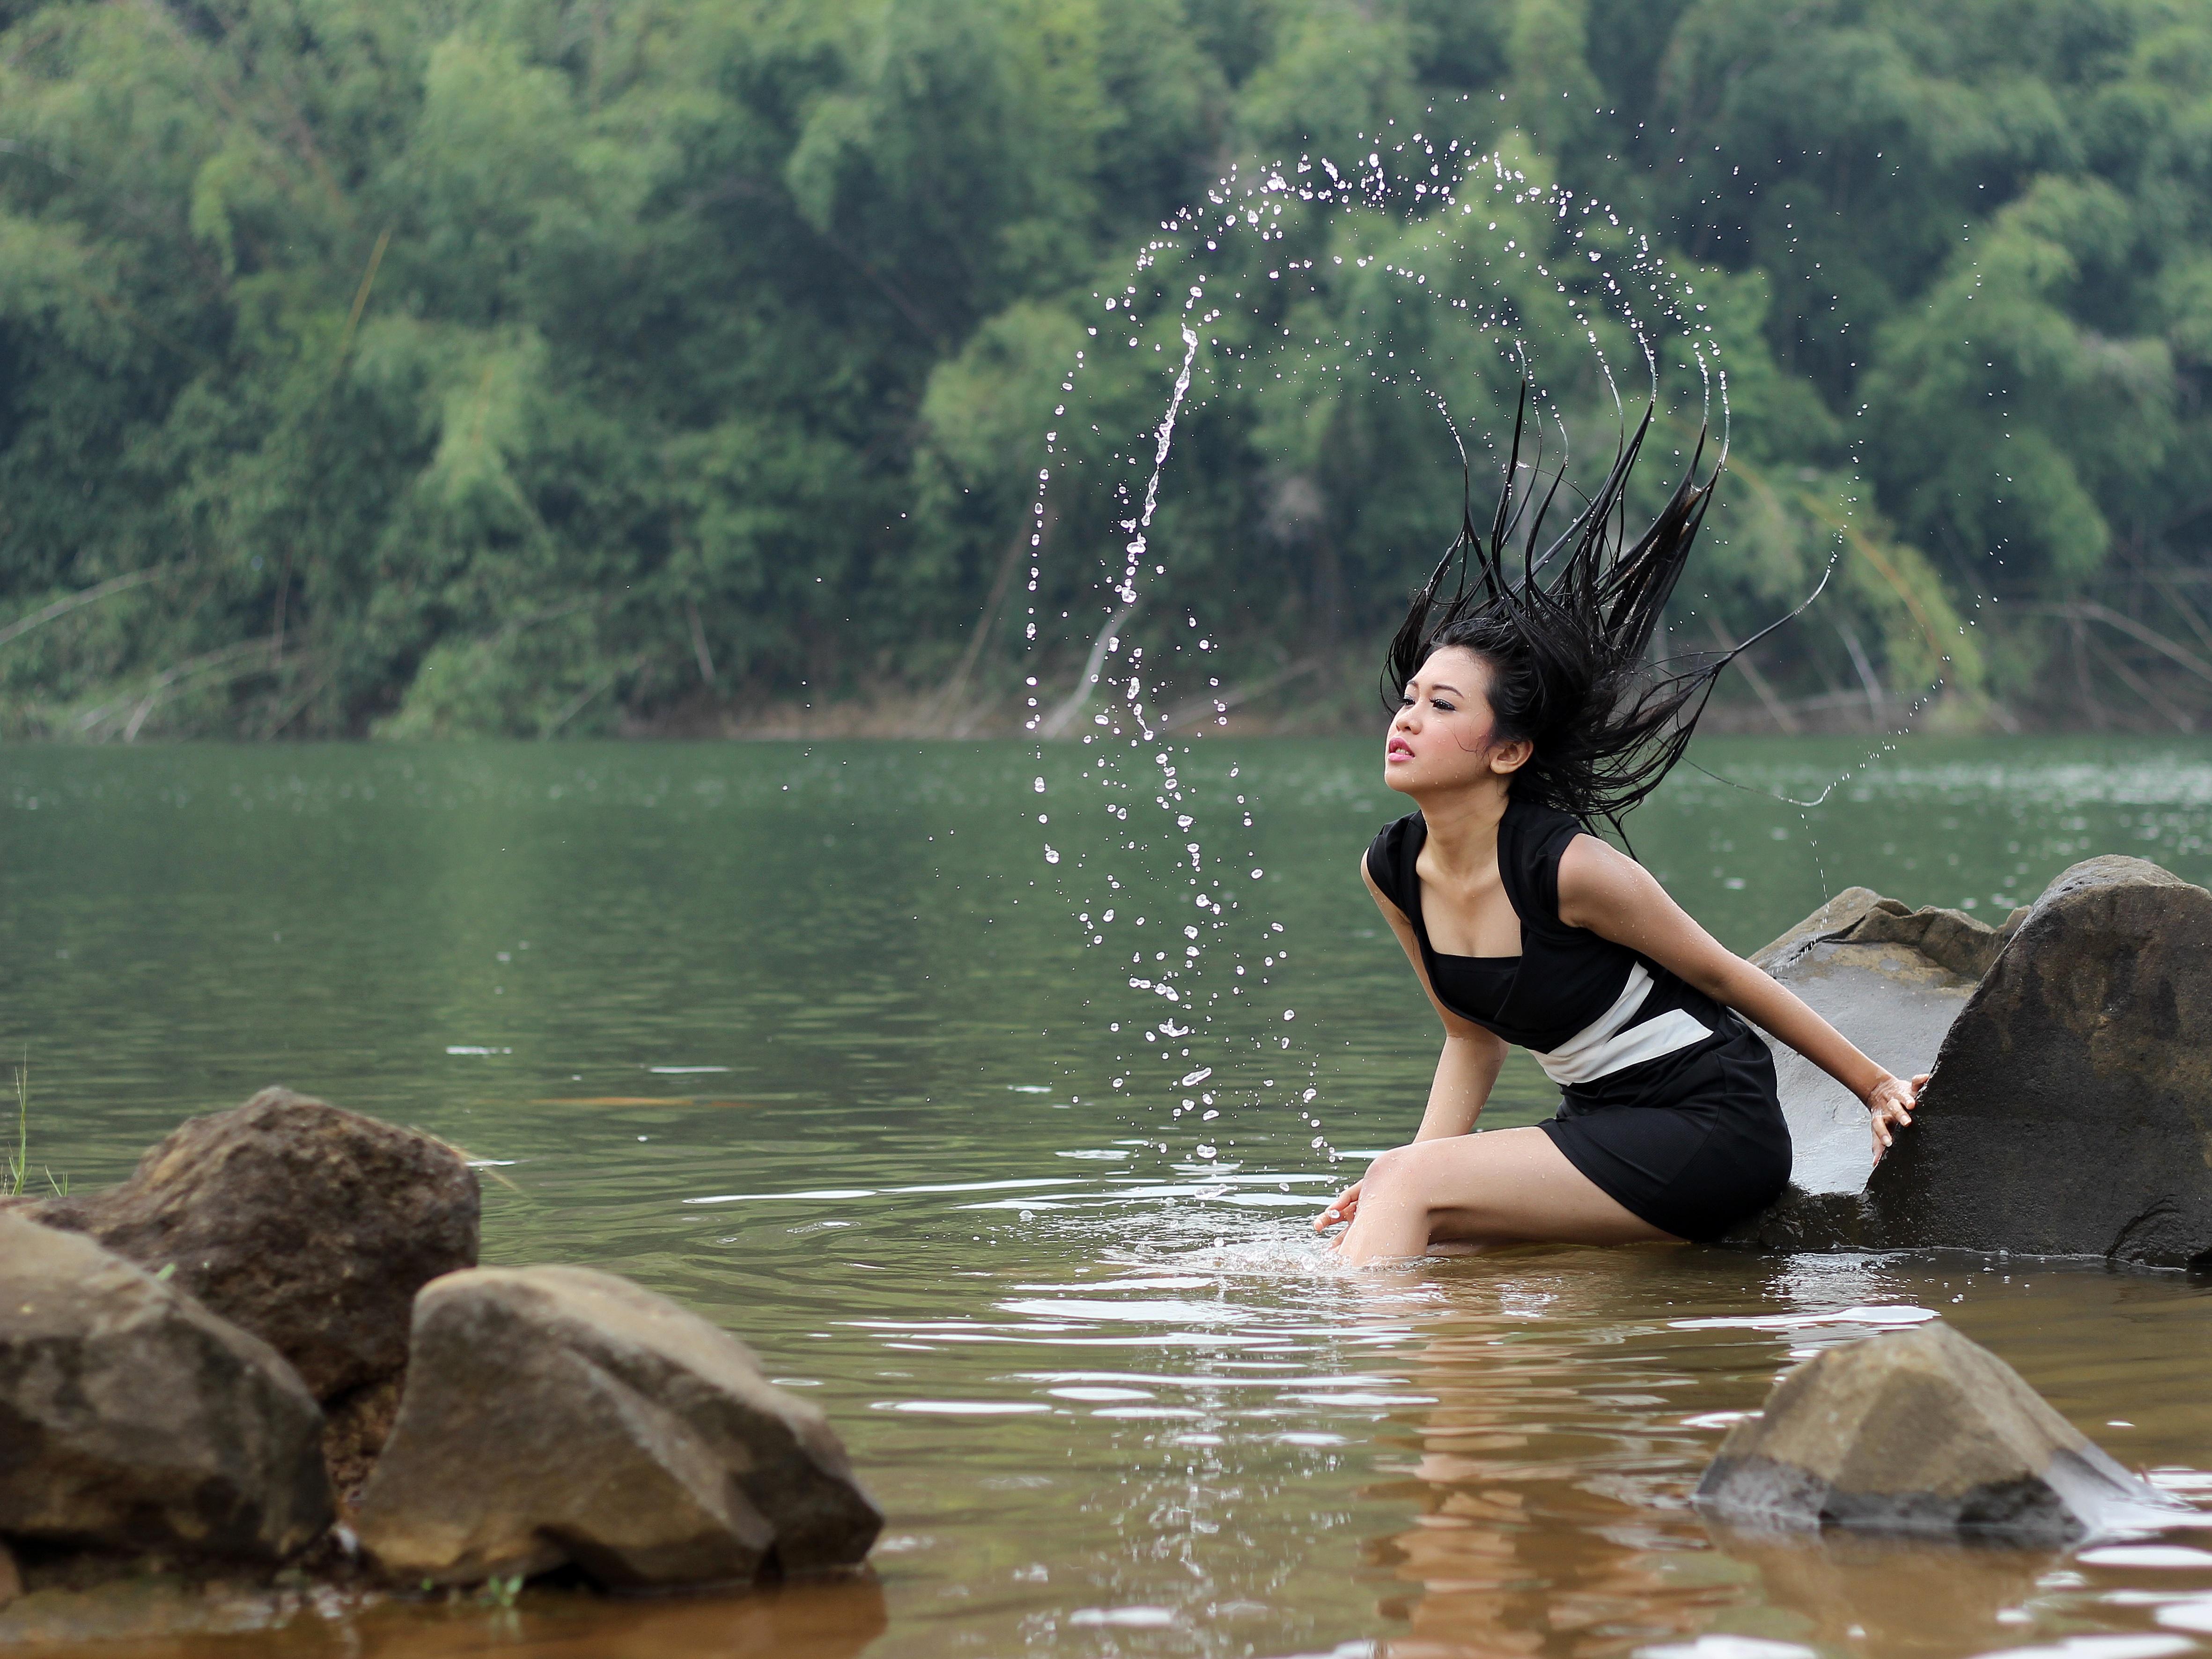 фотосессия в воде на речке дерева